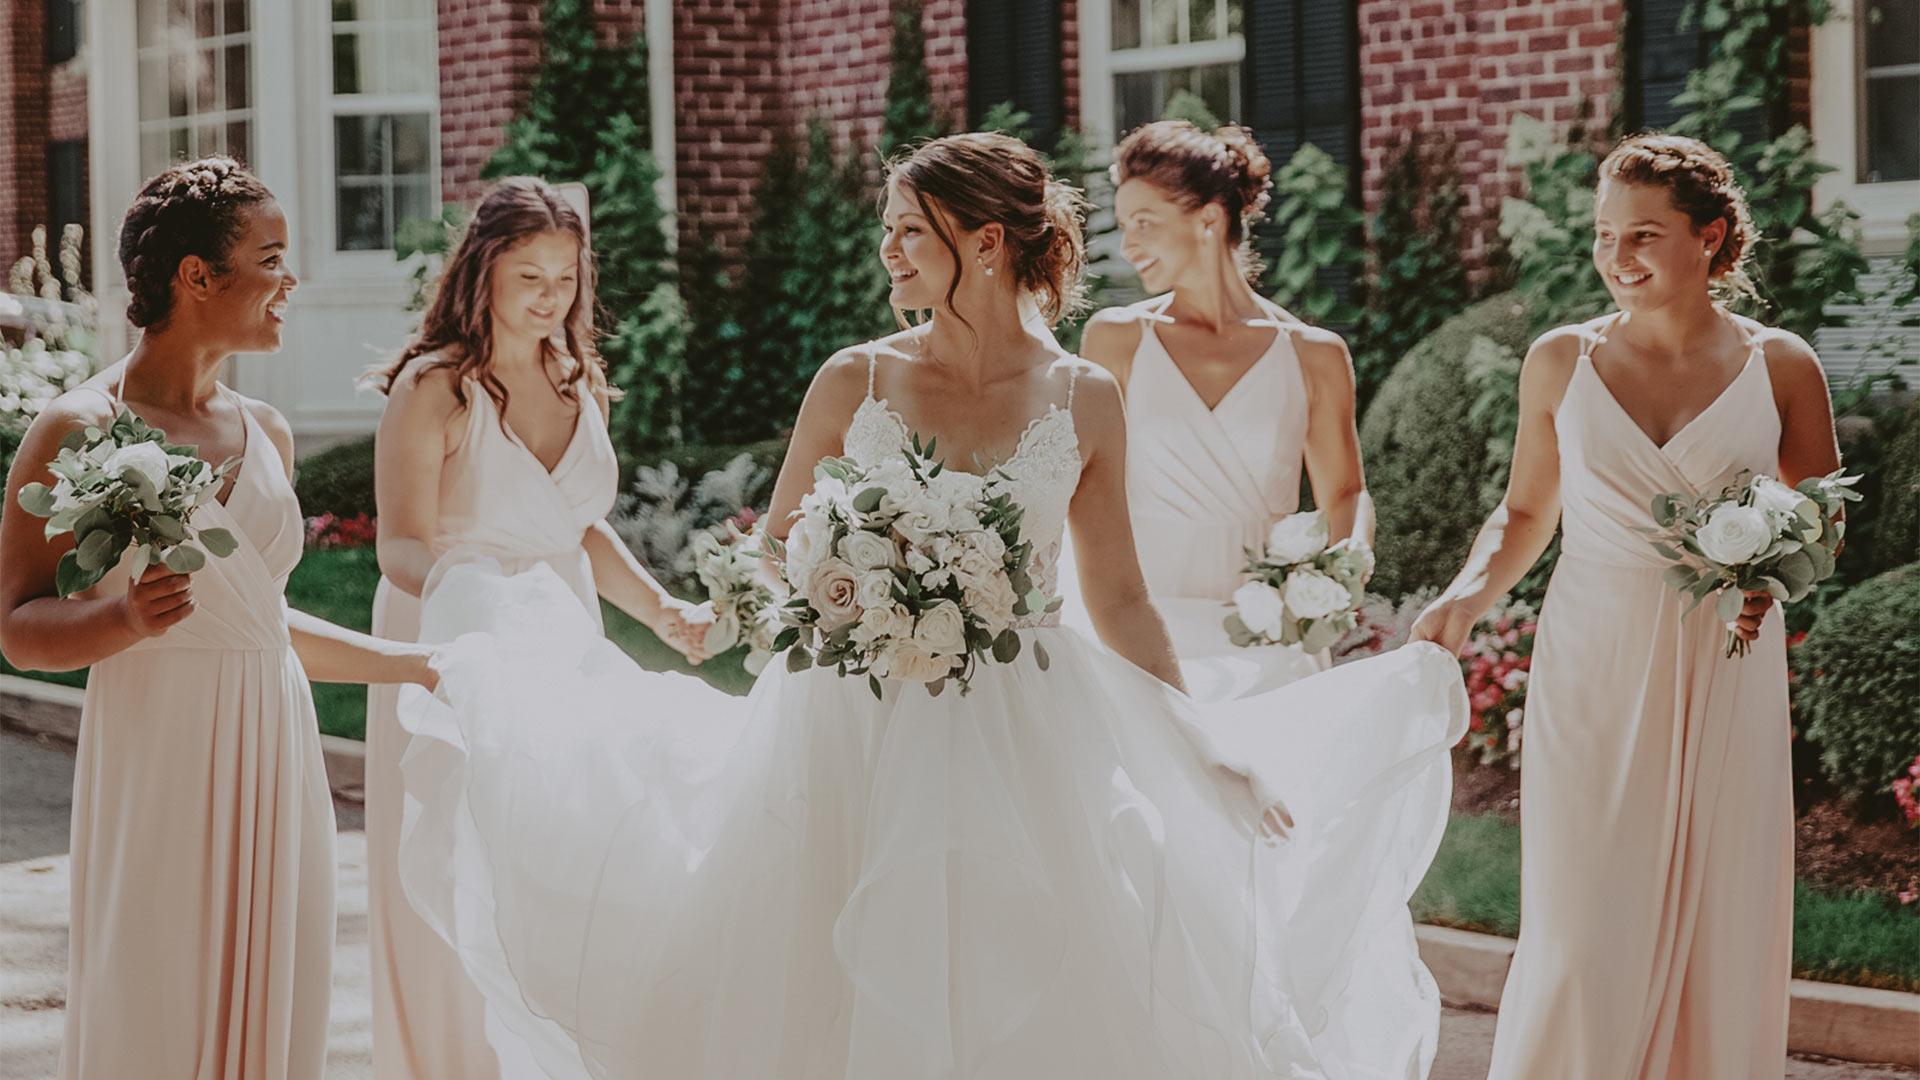 Weddings at Pillar and Post in Niagara on the Lake